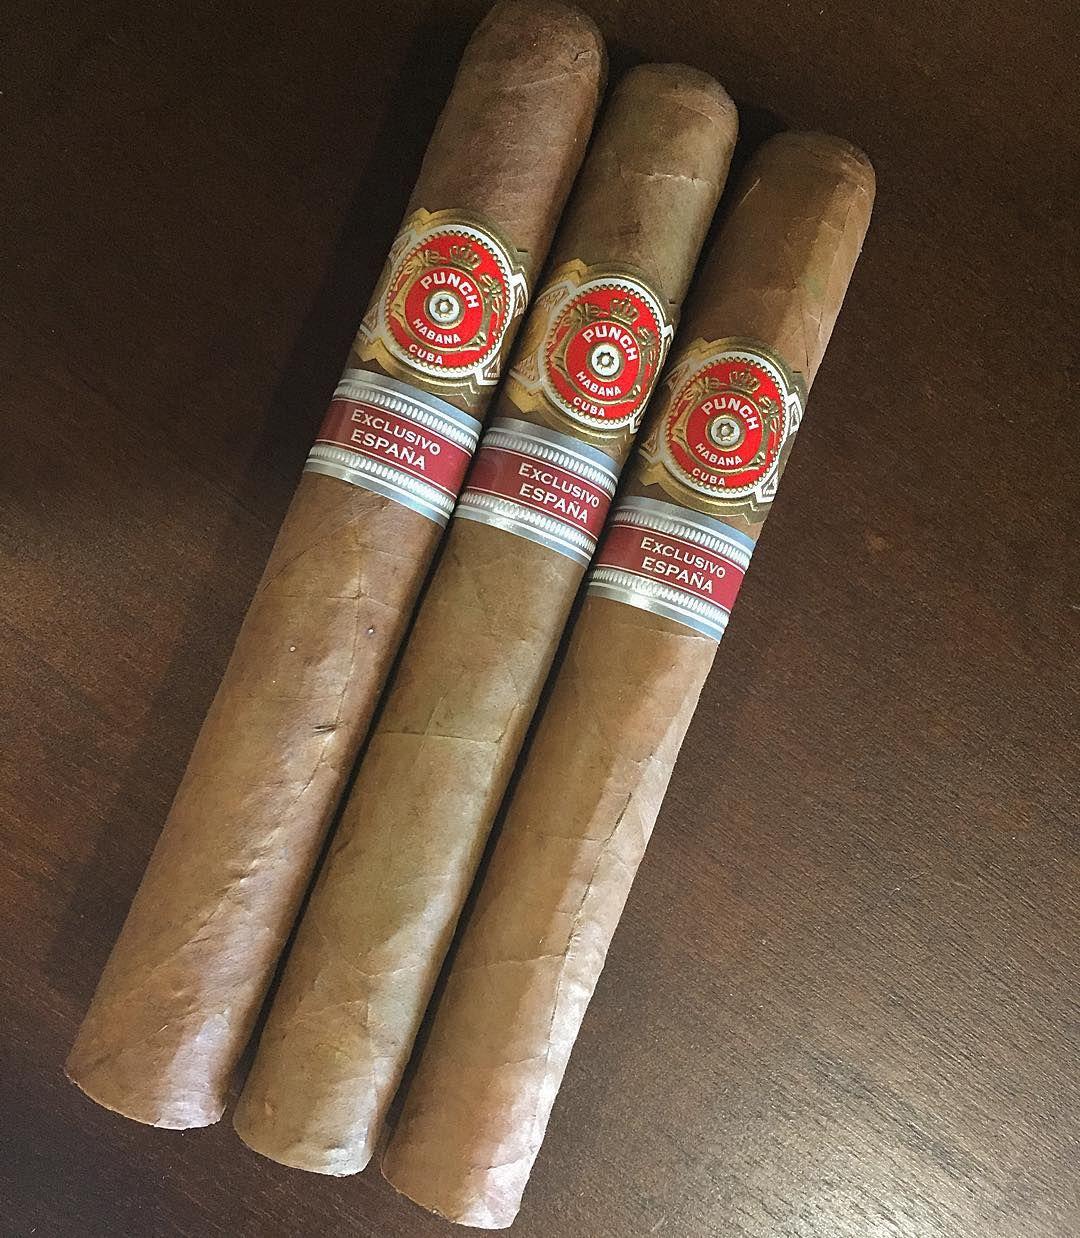 Punch ER Espana 2009 #cuba #cigar #cuban #cigars #charuto #botl #havana #habanos #humidor #zigarren #sotl #smoke #sigari #sigaro #smoking #tobacco #punch #spain #espana by cigar_collector